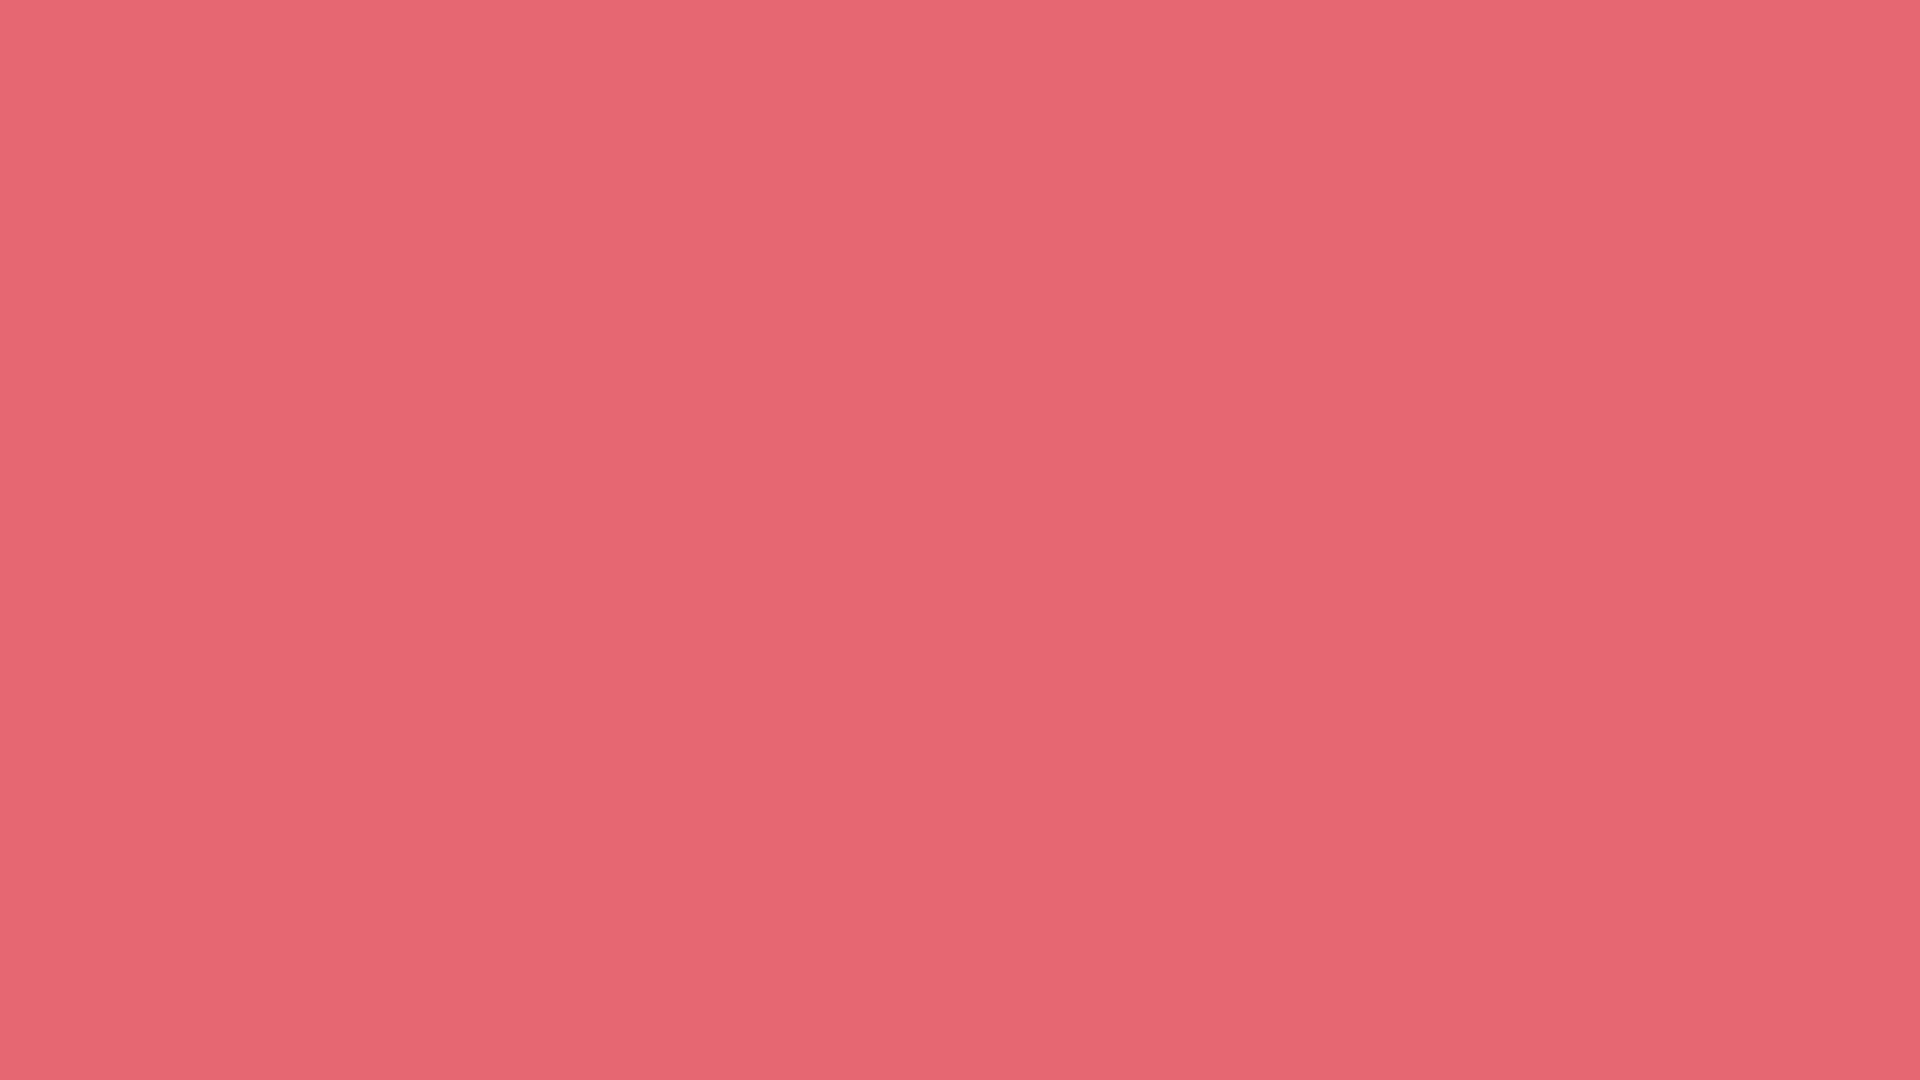 1920x1080 Light Carmine Pink Solid Color Background